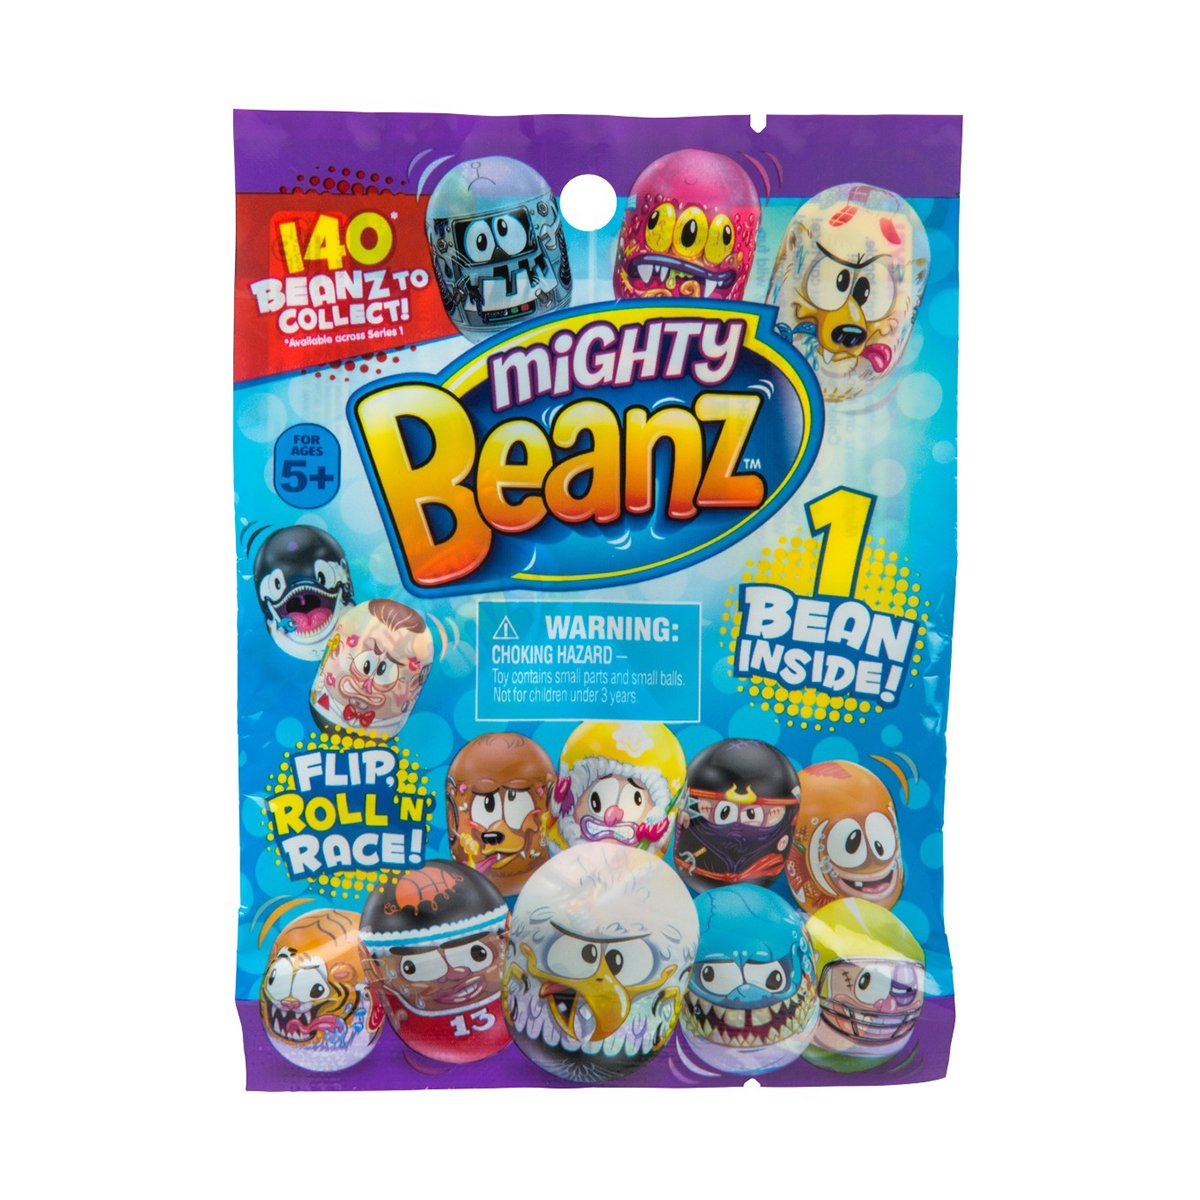 Figurina surpriza Mighty Beanz, S1